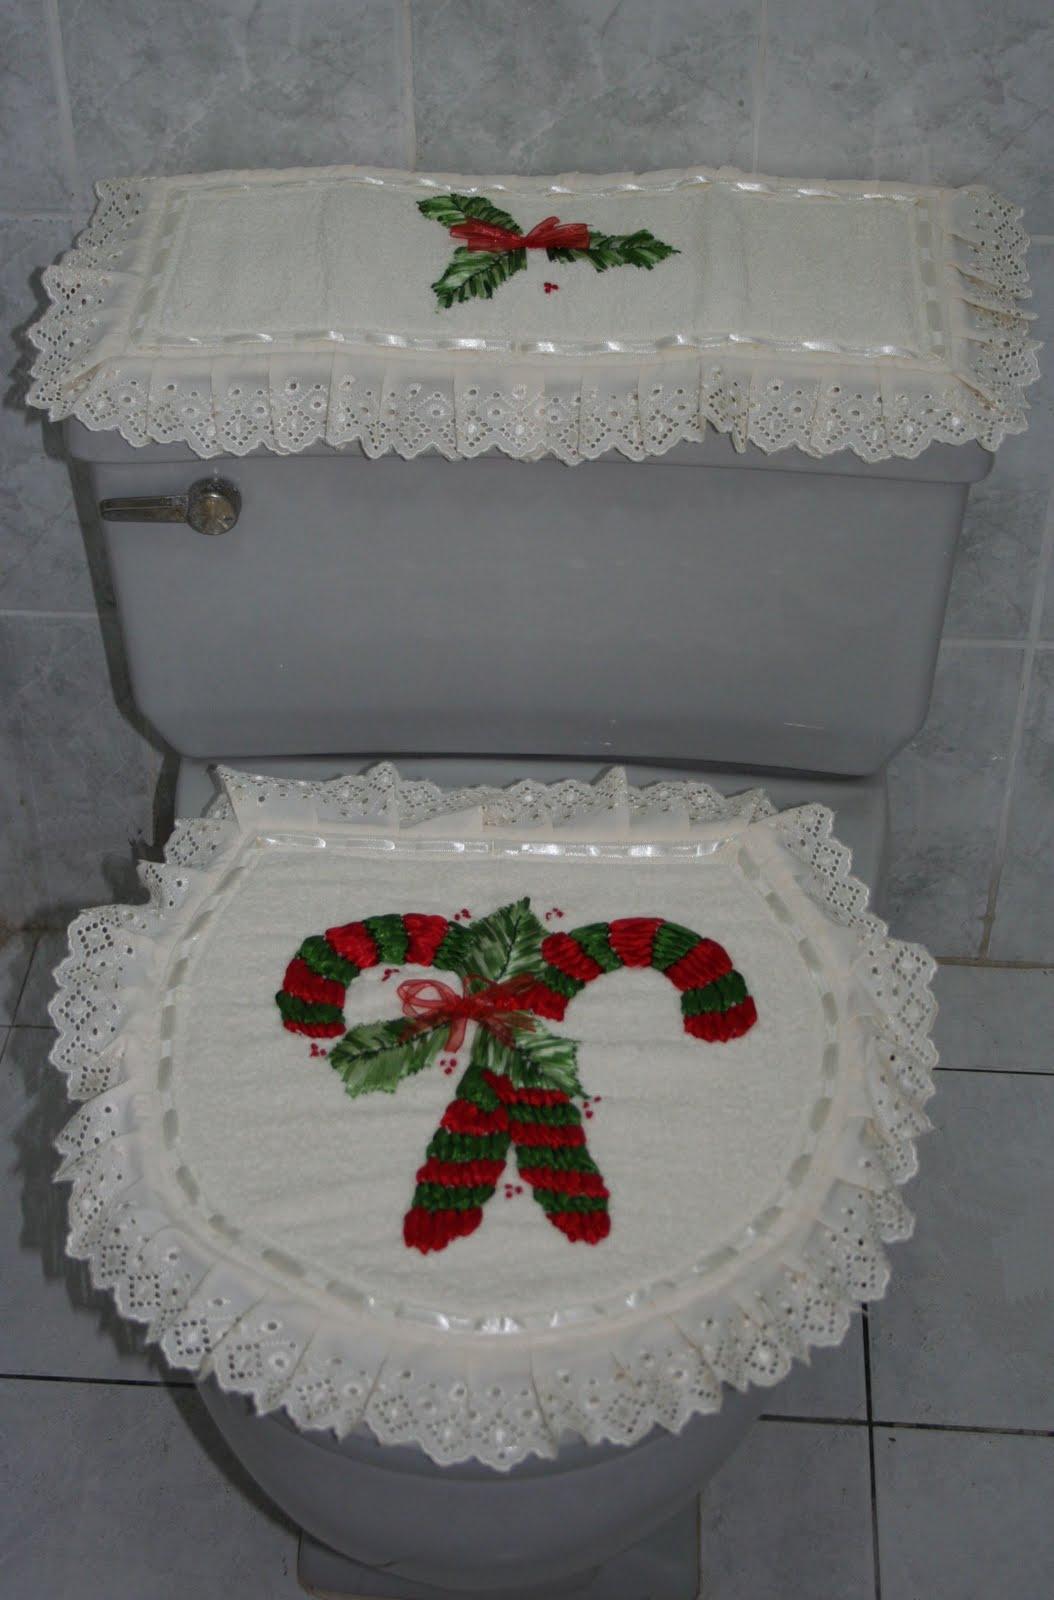 Baño Navideno Navidad:Hermoso juego de baño bordado a mano con cintas de seda, con motivo